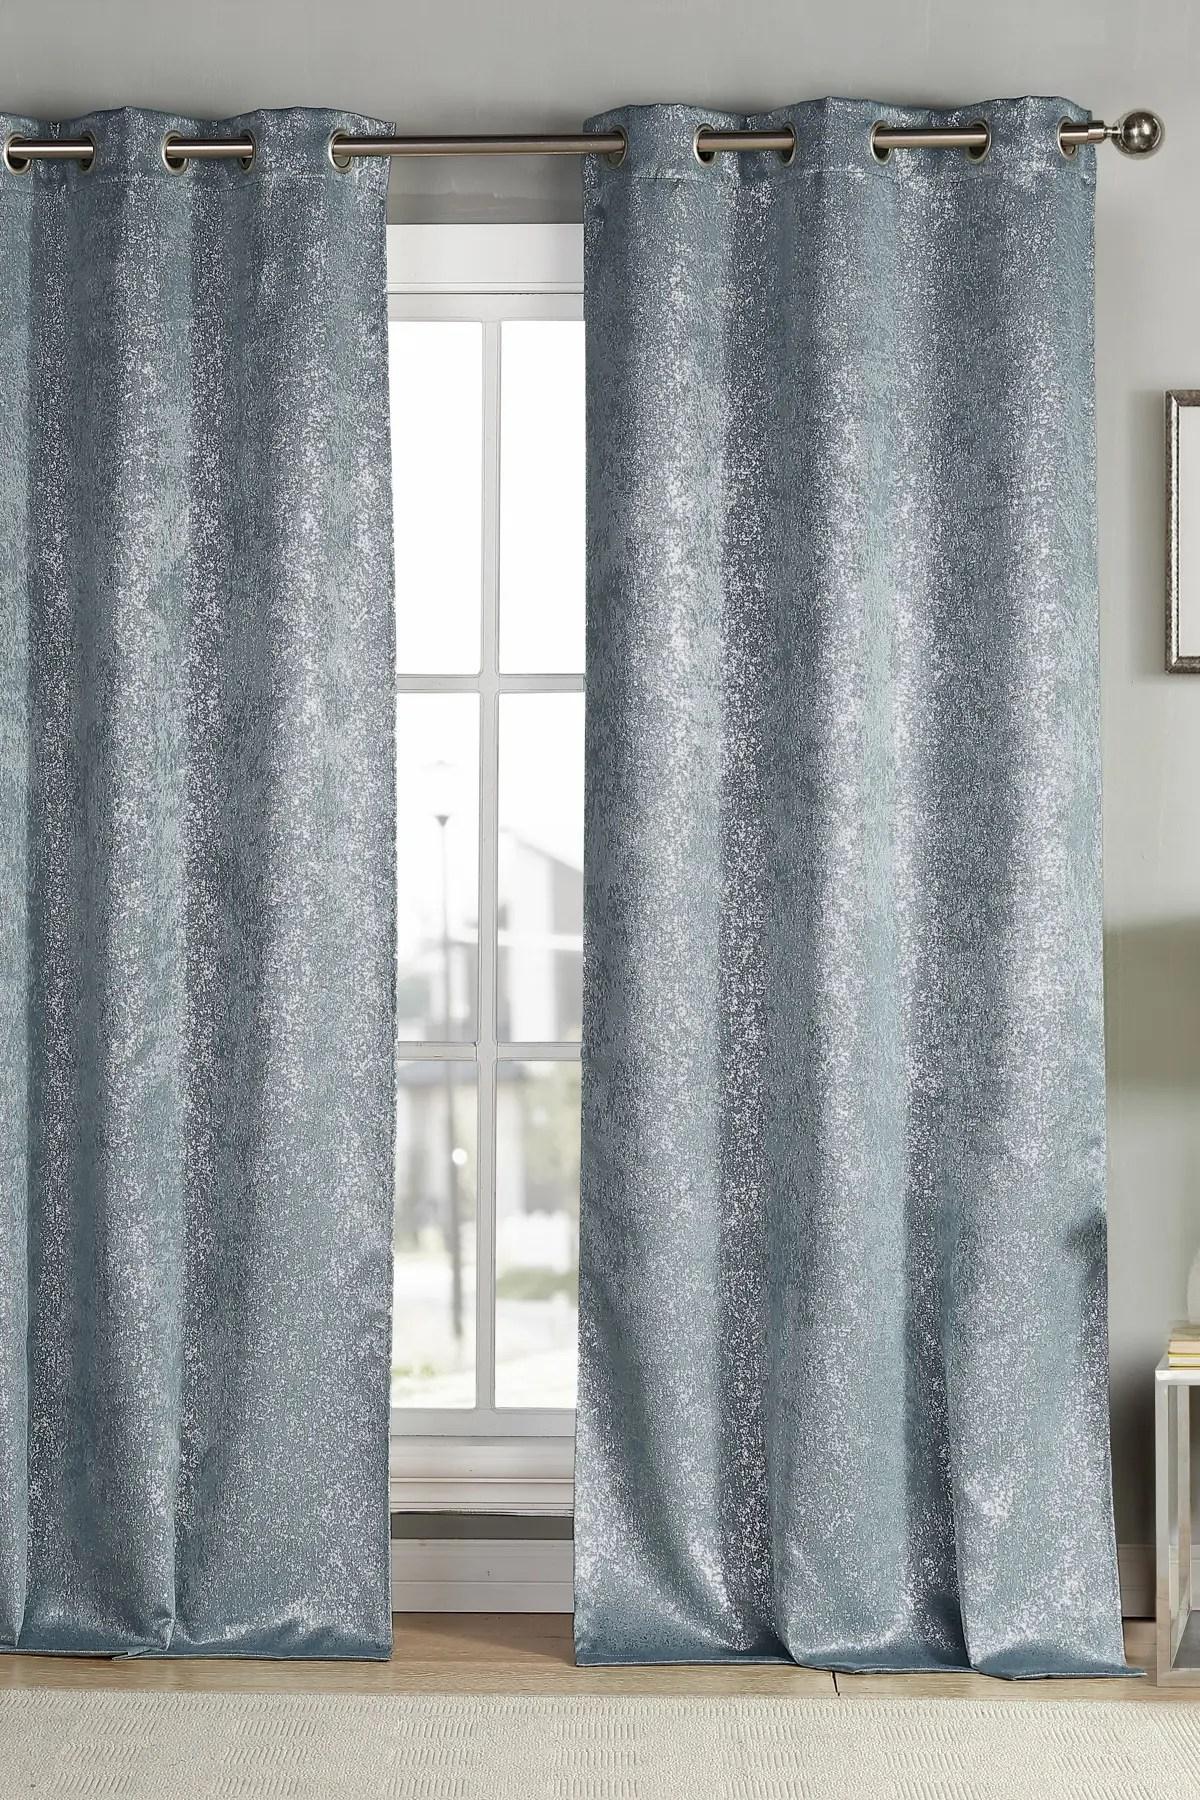 duck river textile maddie metallic specks blackout curtain set slate blue nordstrom rack